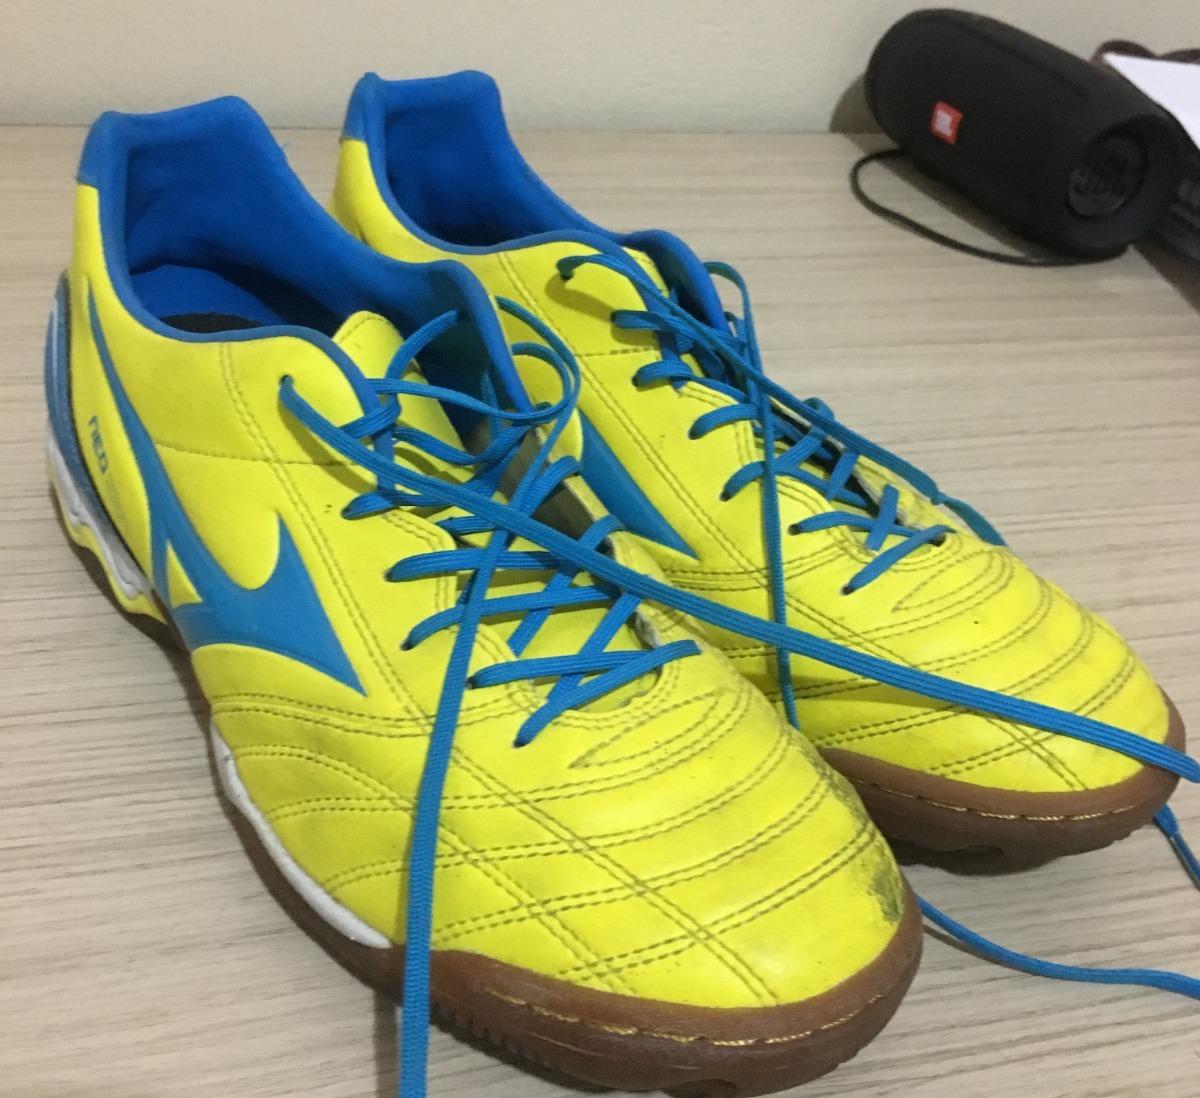 ba17f99d954b9 Chuteira Futsal Mizuno Morelia Neo Zen + Brinde Caneleira - R$ 120 .